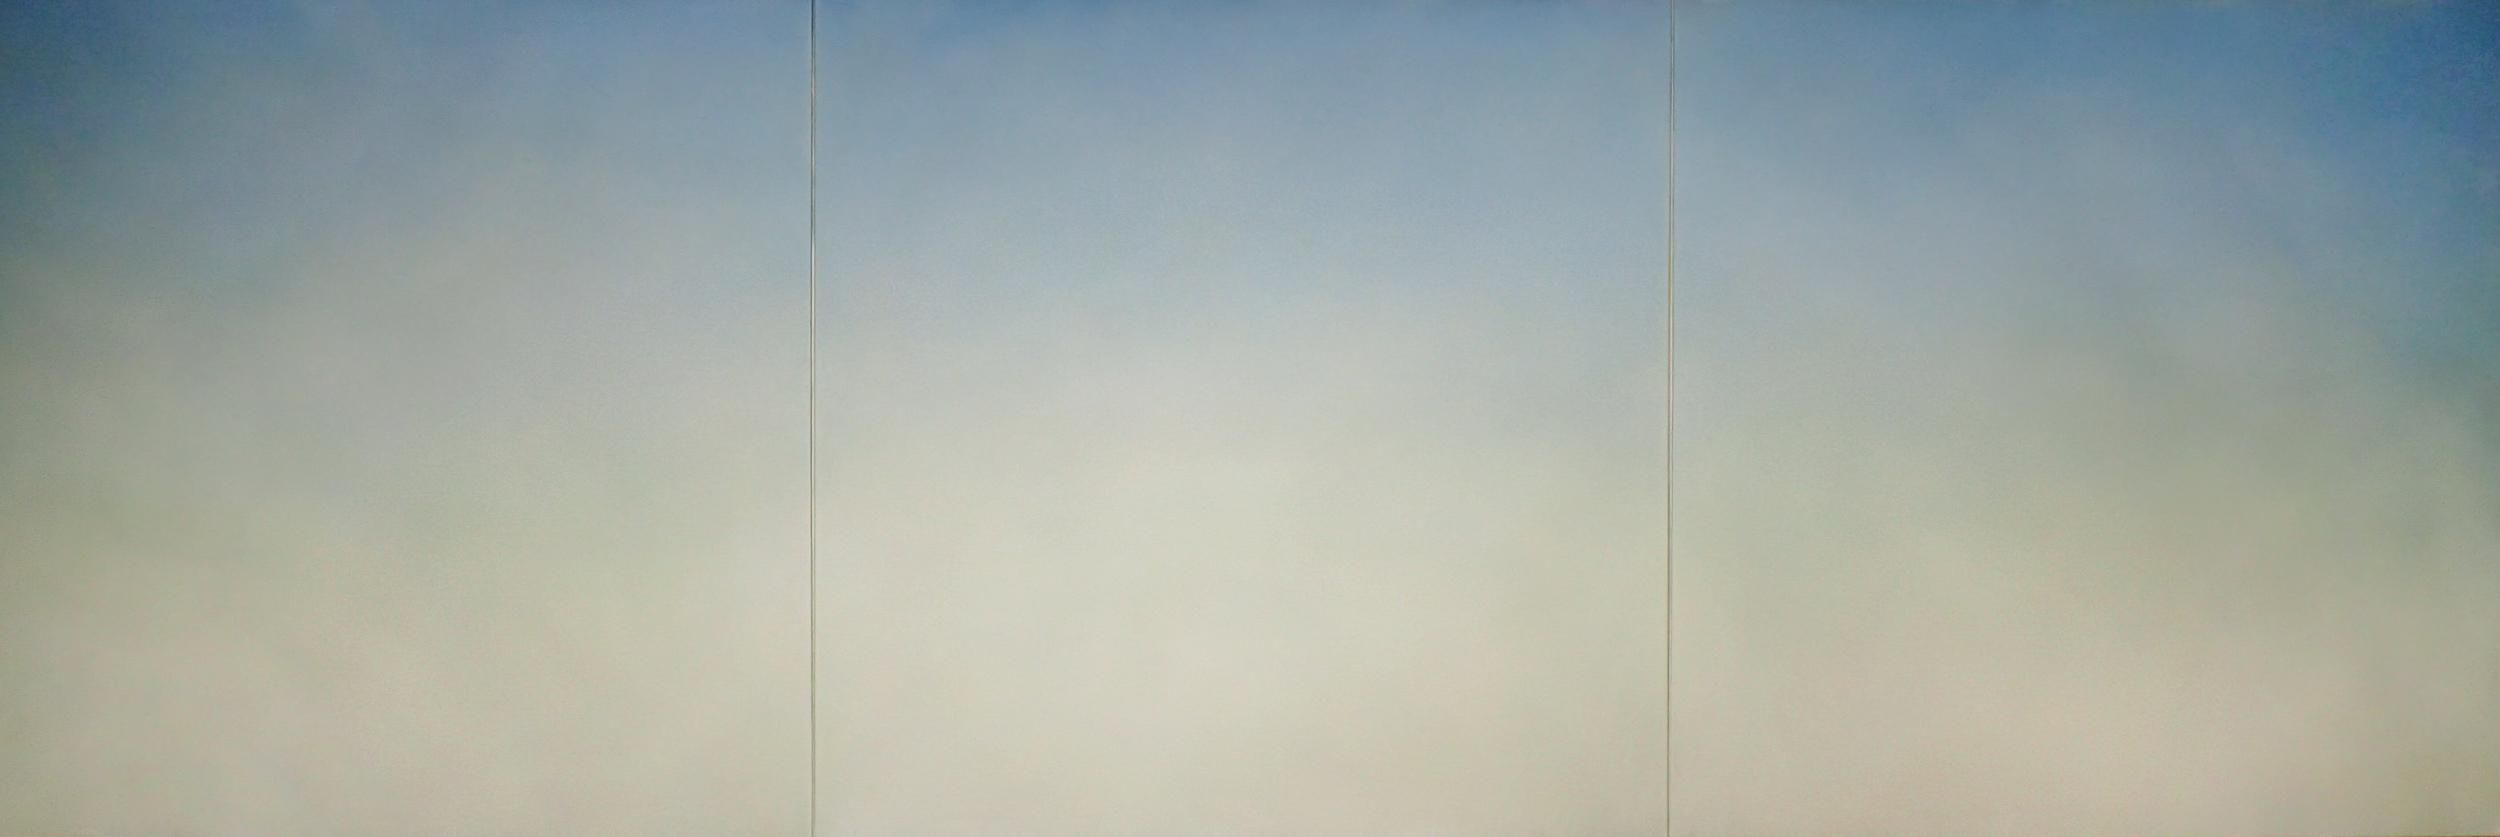 "Untitled - Minnesota, 2016, acrylic on canvas, 40"" x 120"""